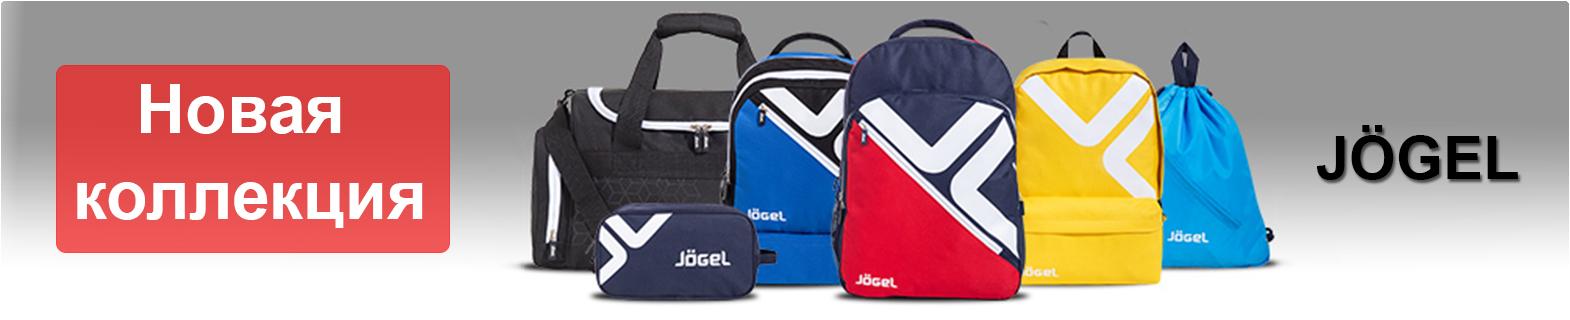 bb4d2fc7015d Сумки спортивные, купить спортивную фирменную сумку, сумка reebok ...